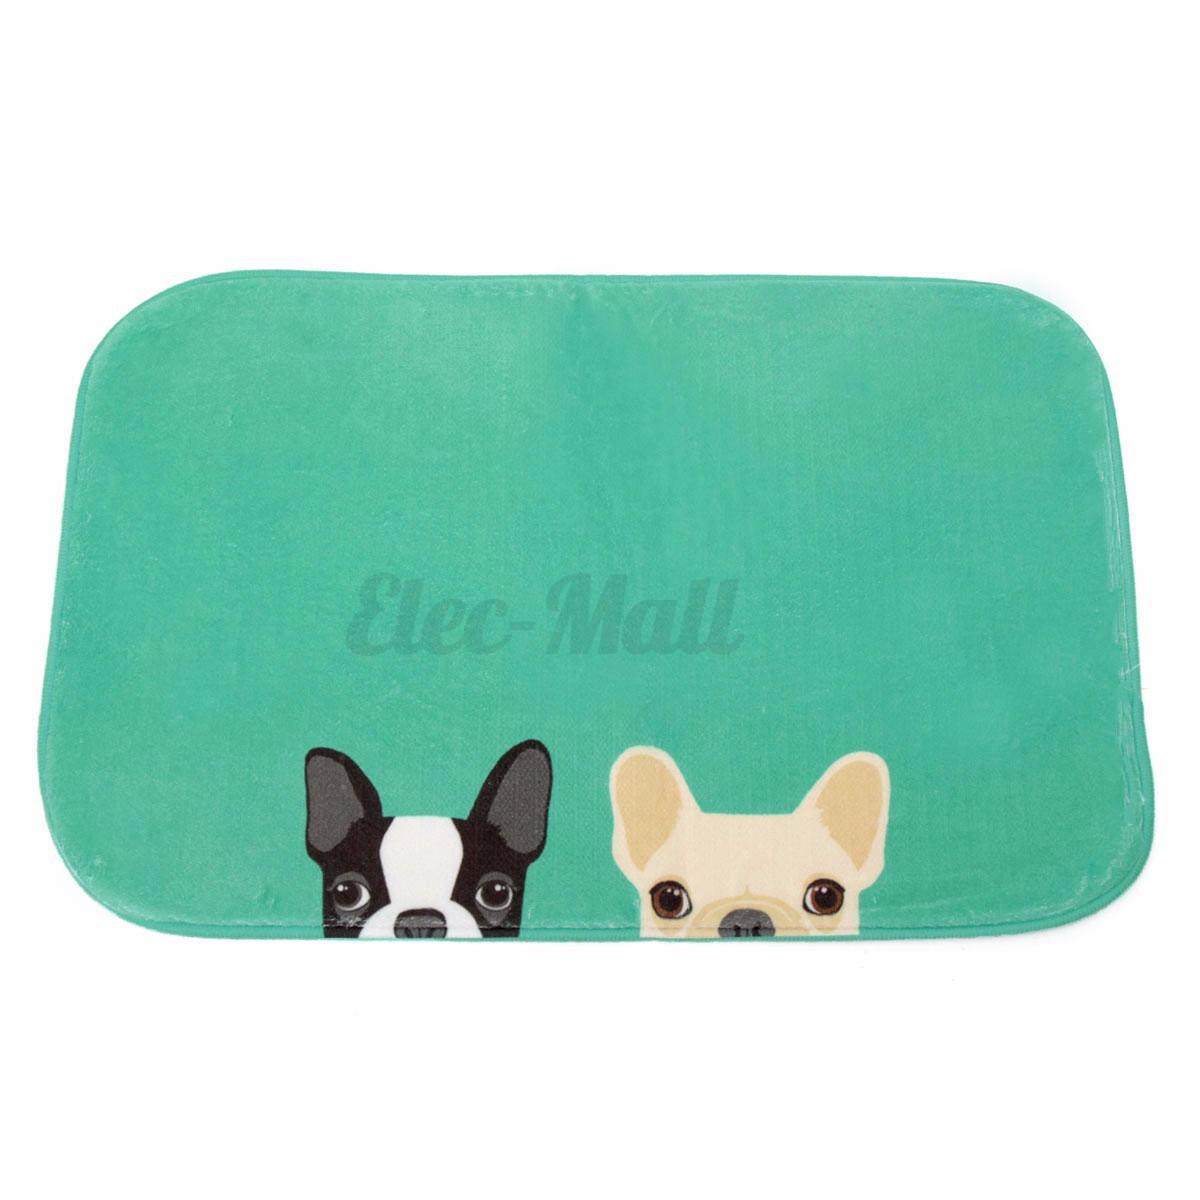 Chihuahua Dog Rug Anti-Slip Plush Door Pad Floor Bathroom